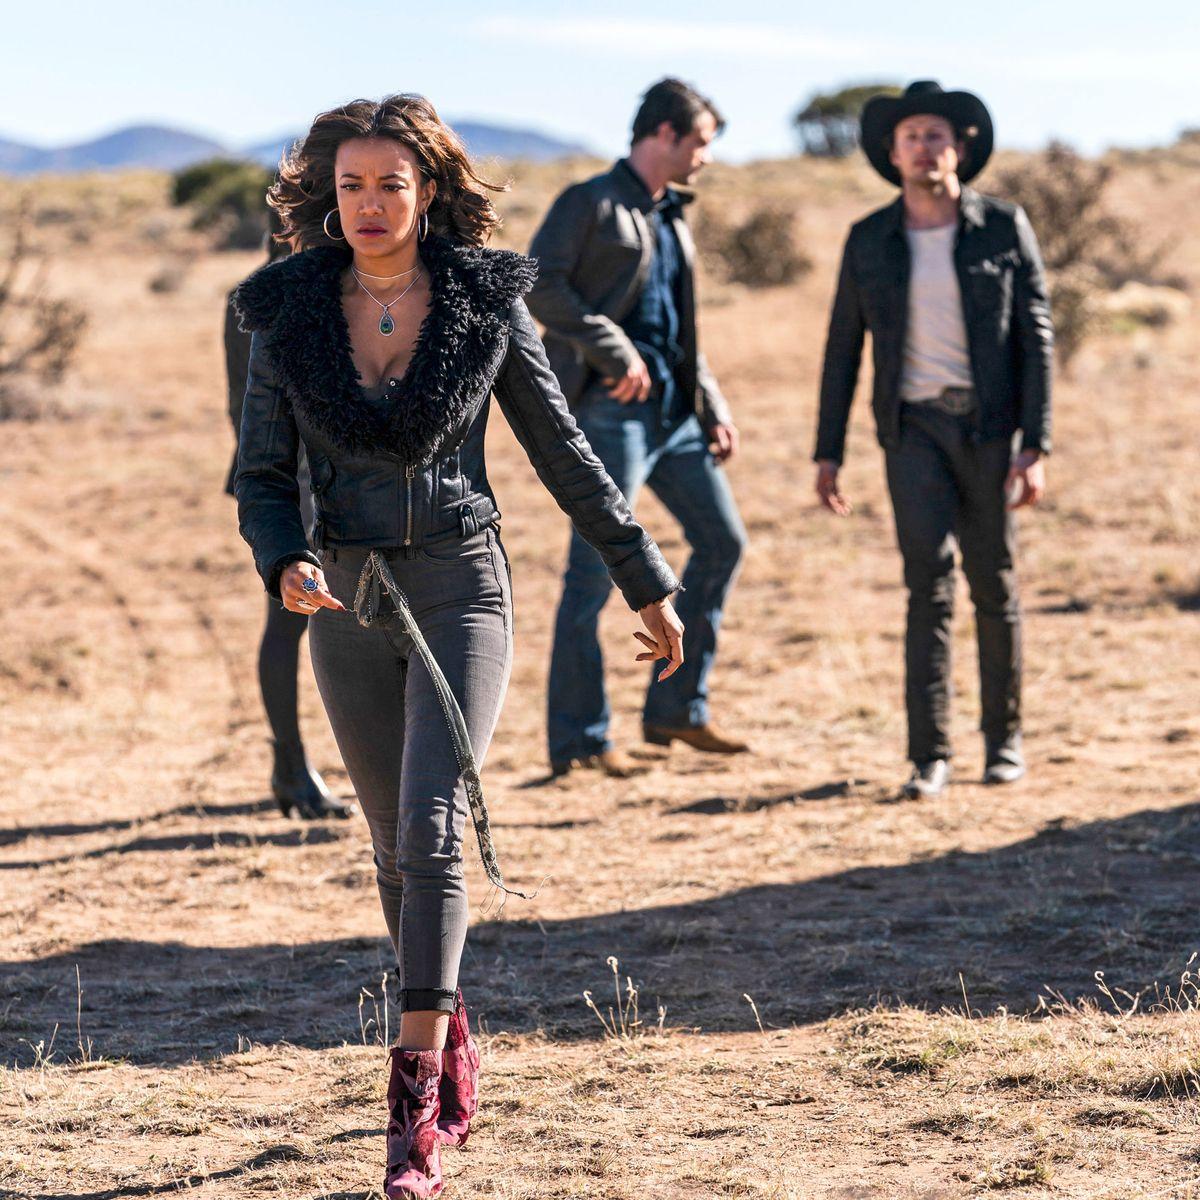 Roswell, New Mexico Recap, Season 1, Episode 9